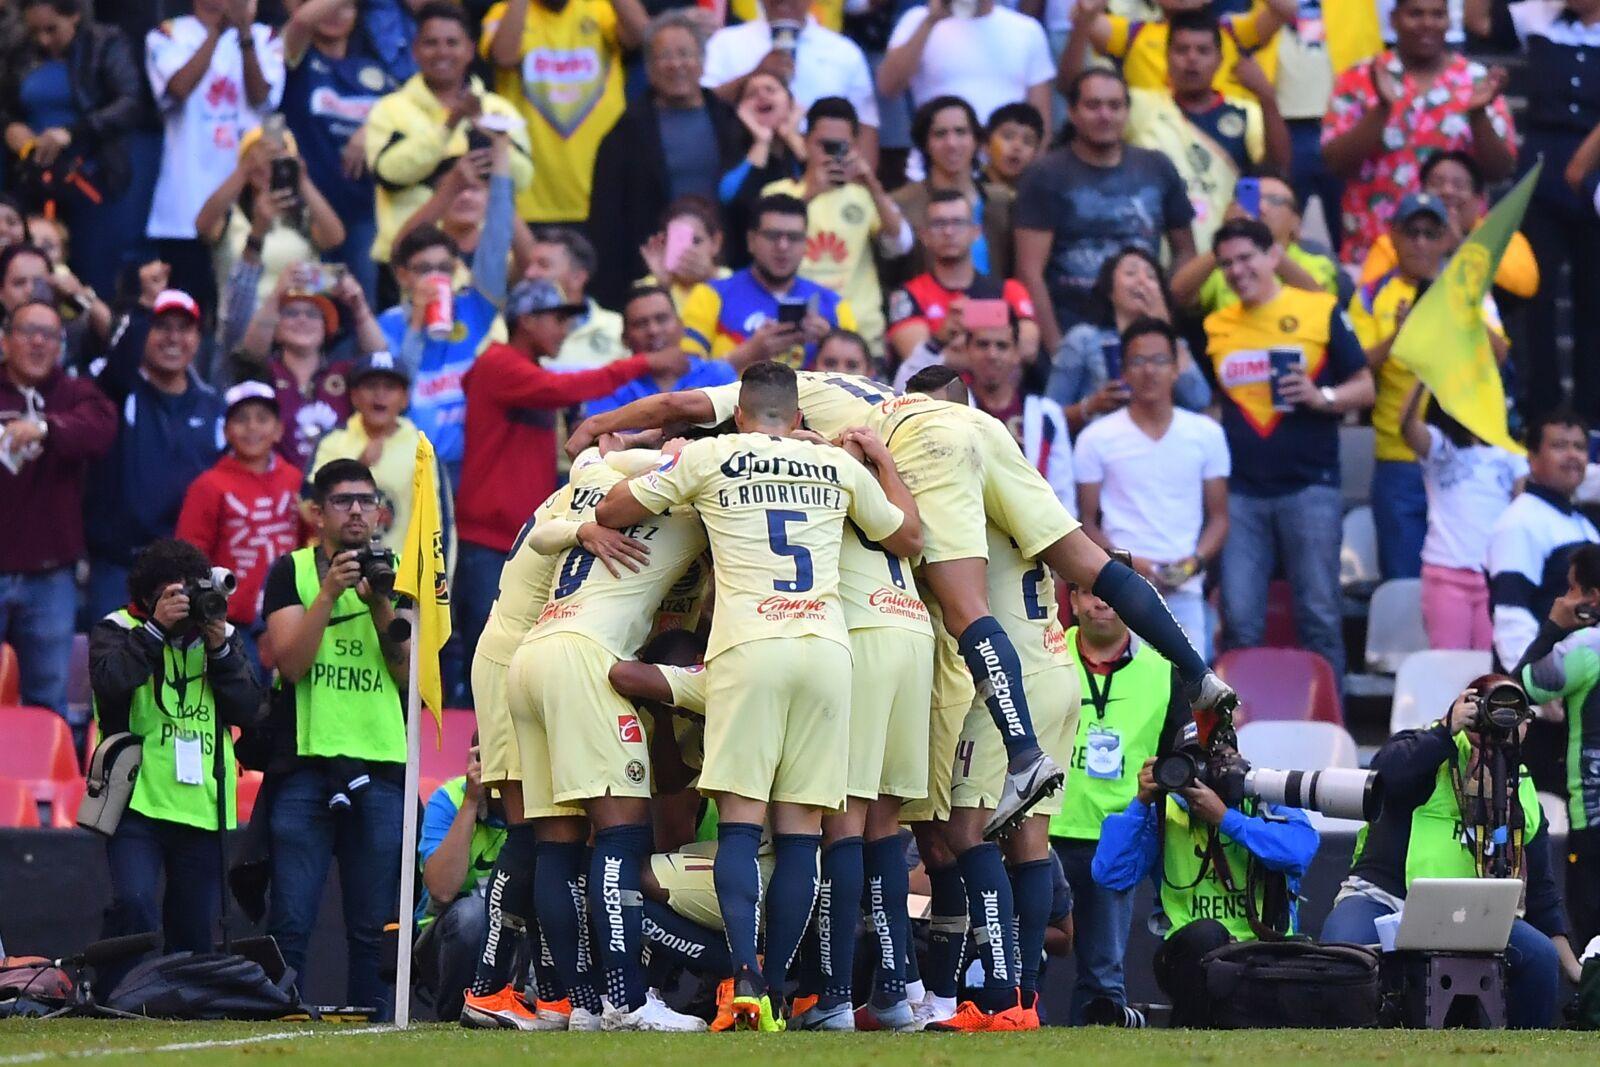 c8e3132553a Liga MX: America is the new favorite for the 2018 Apertura title - Viva  Liga MX